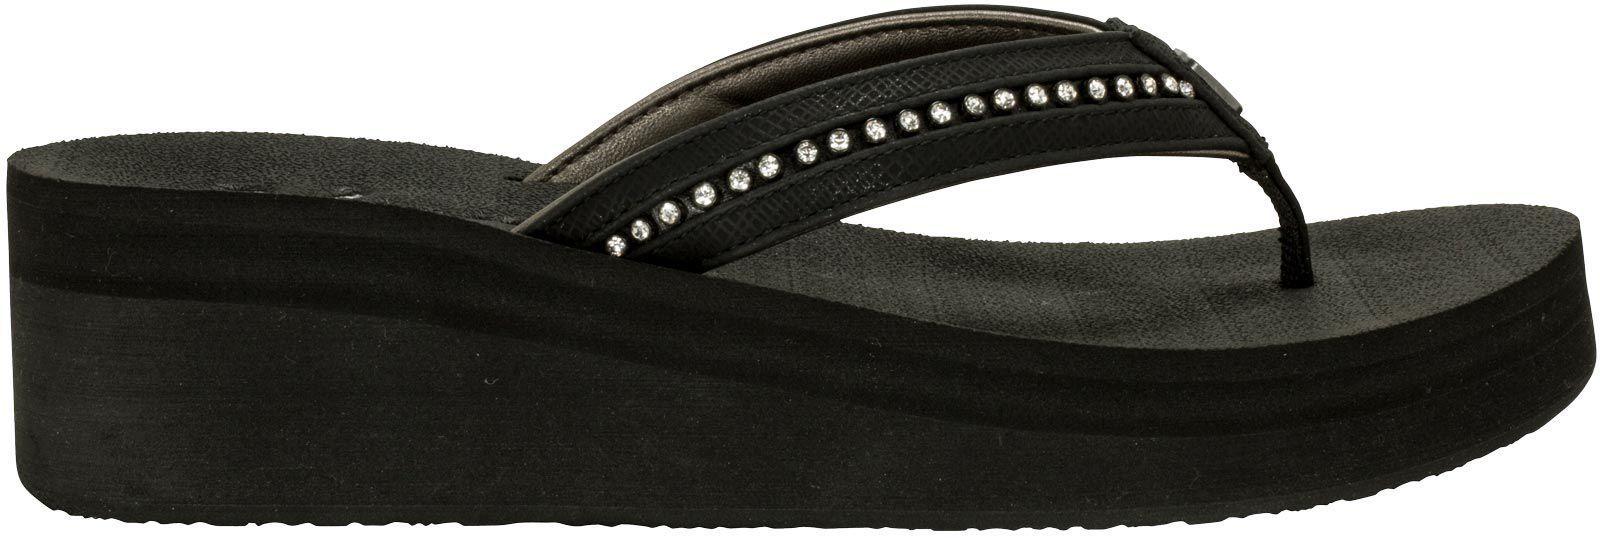 dba41128e Lyst - Cobian Tiffany Flip Flops in Black